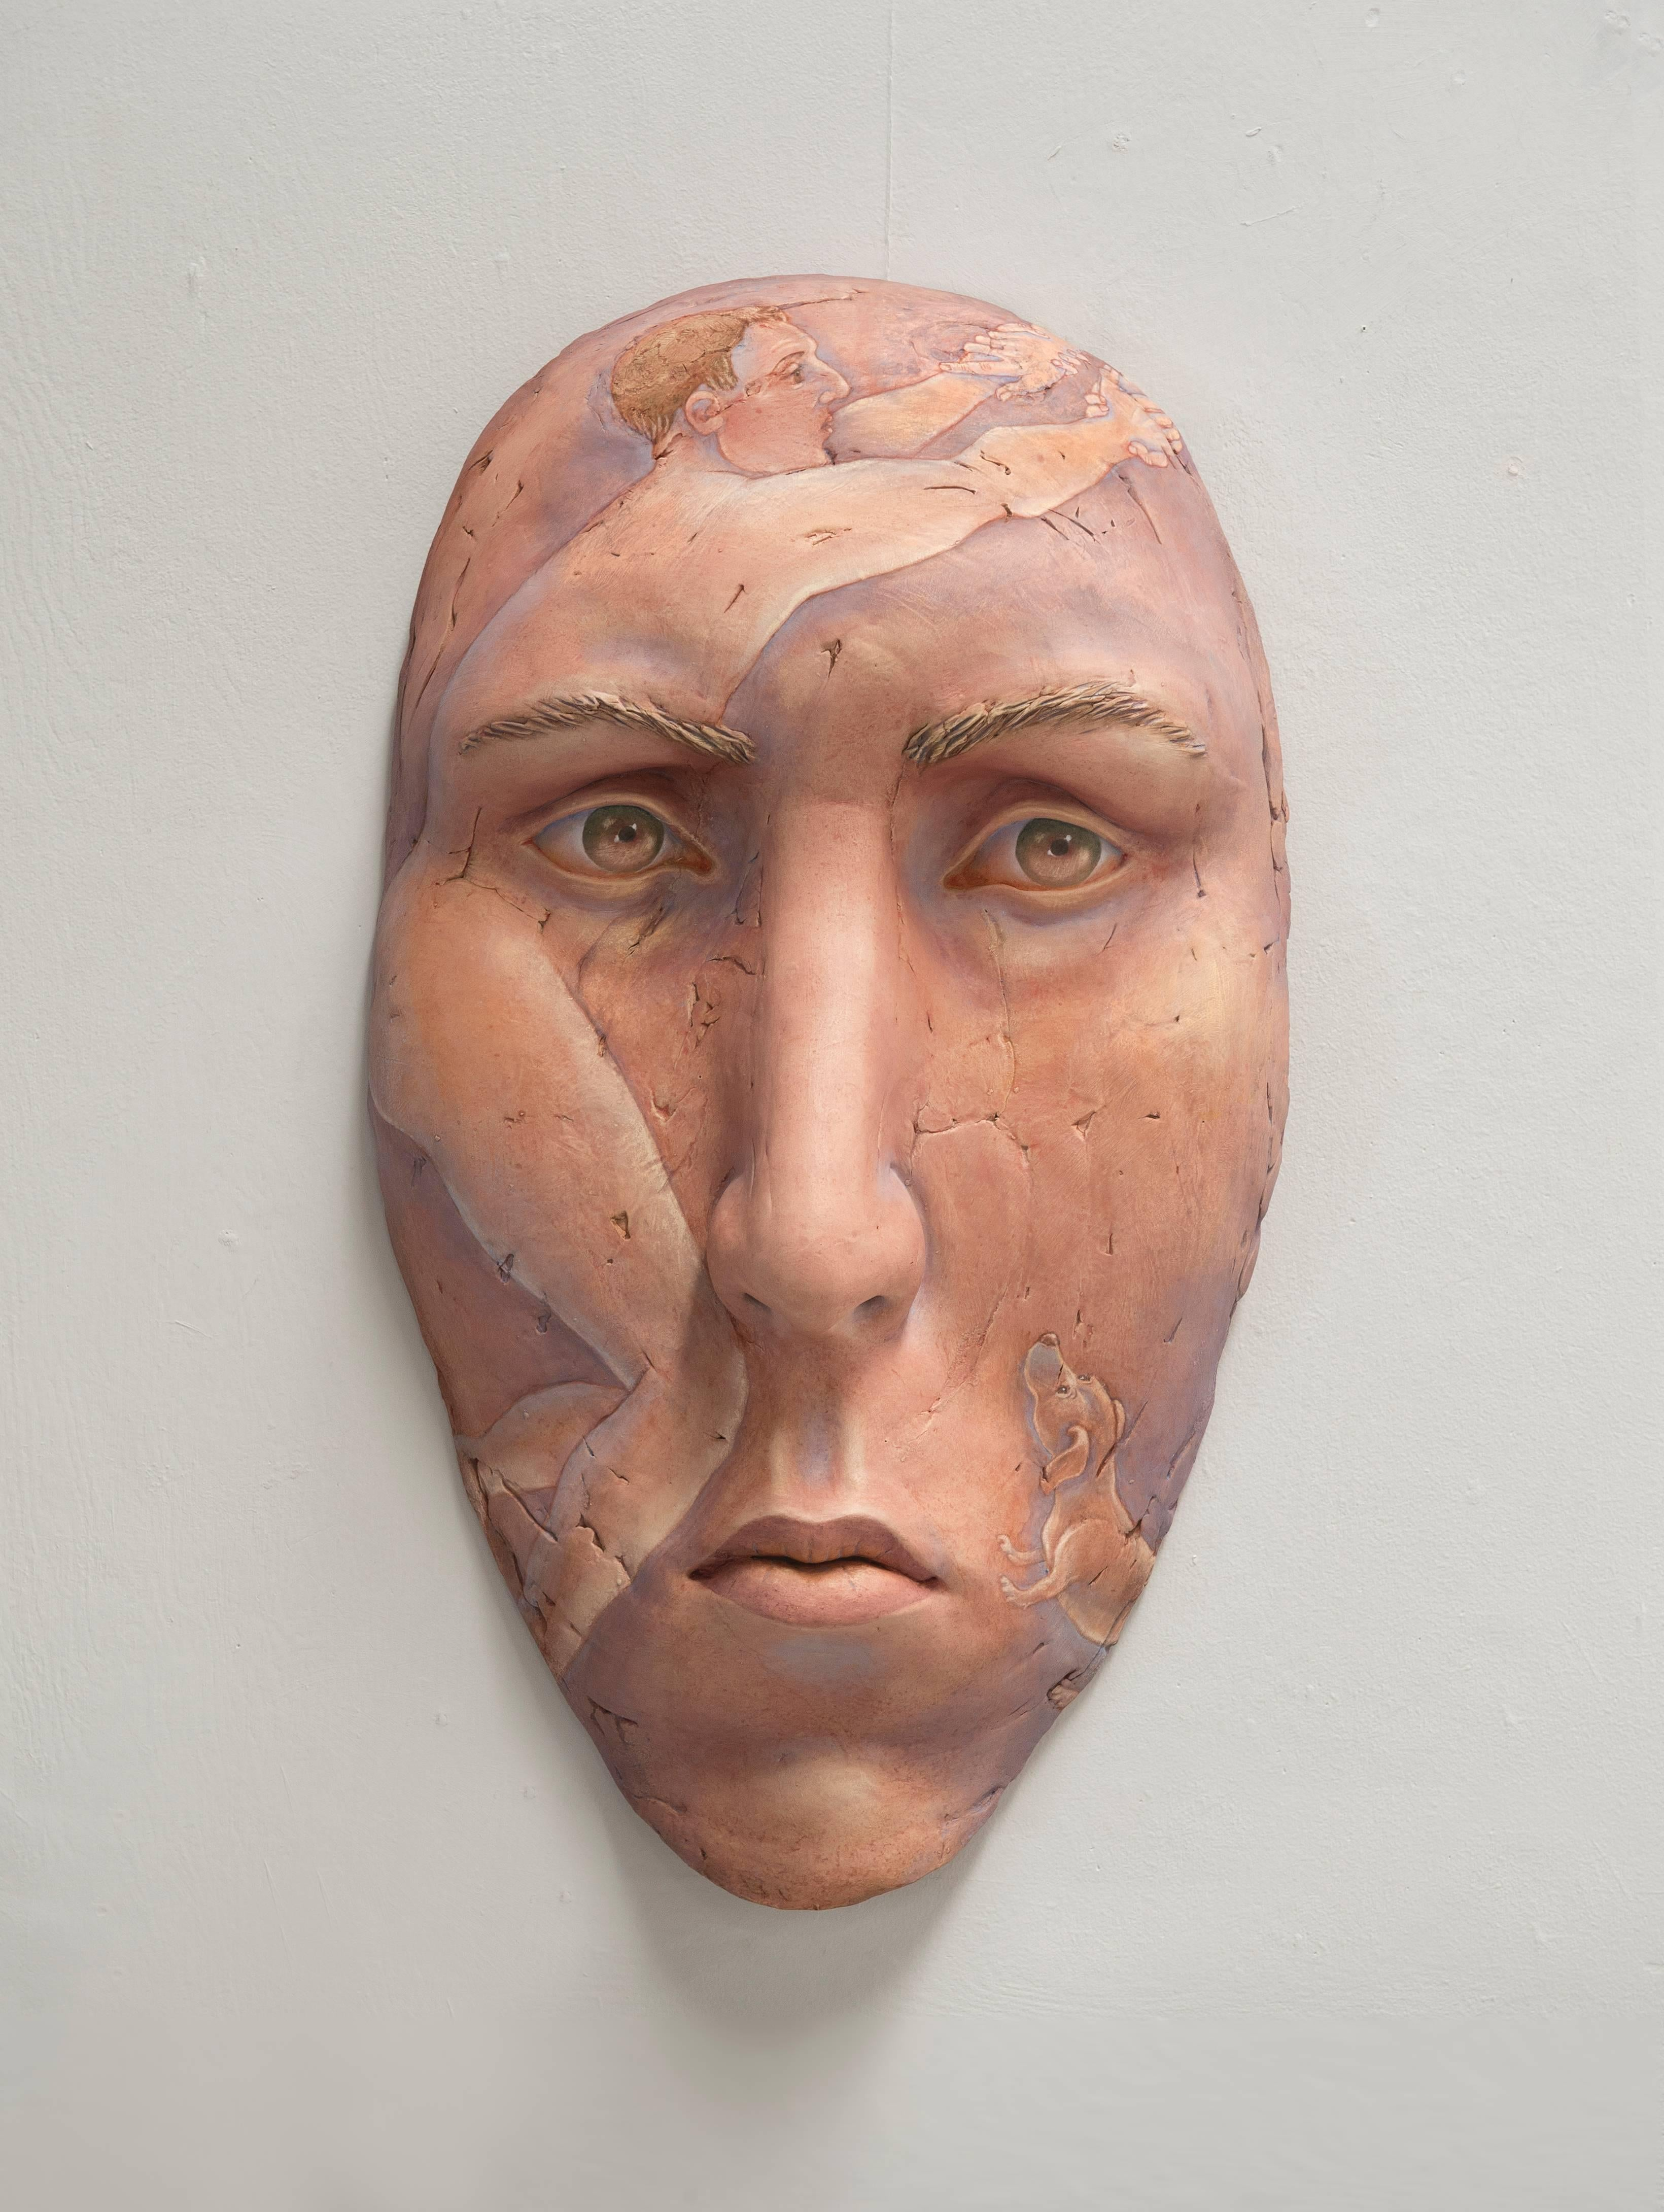 """Within Reach"", Contemporary, Ceramic, Sculpture, Painted, Portrait, Figurative"